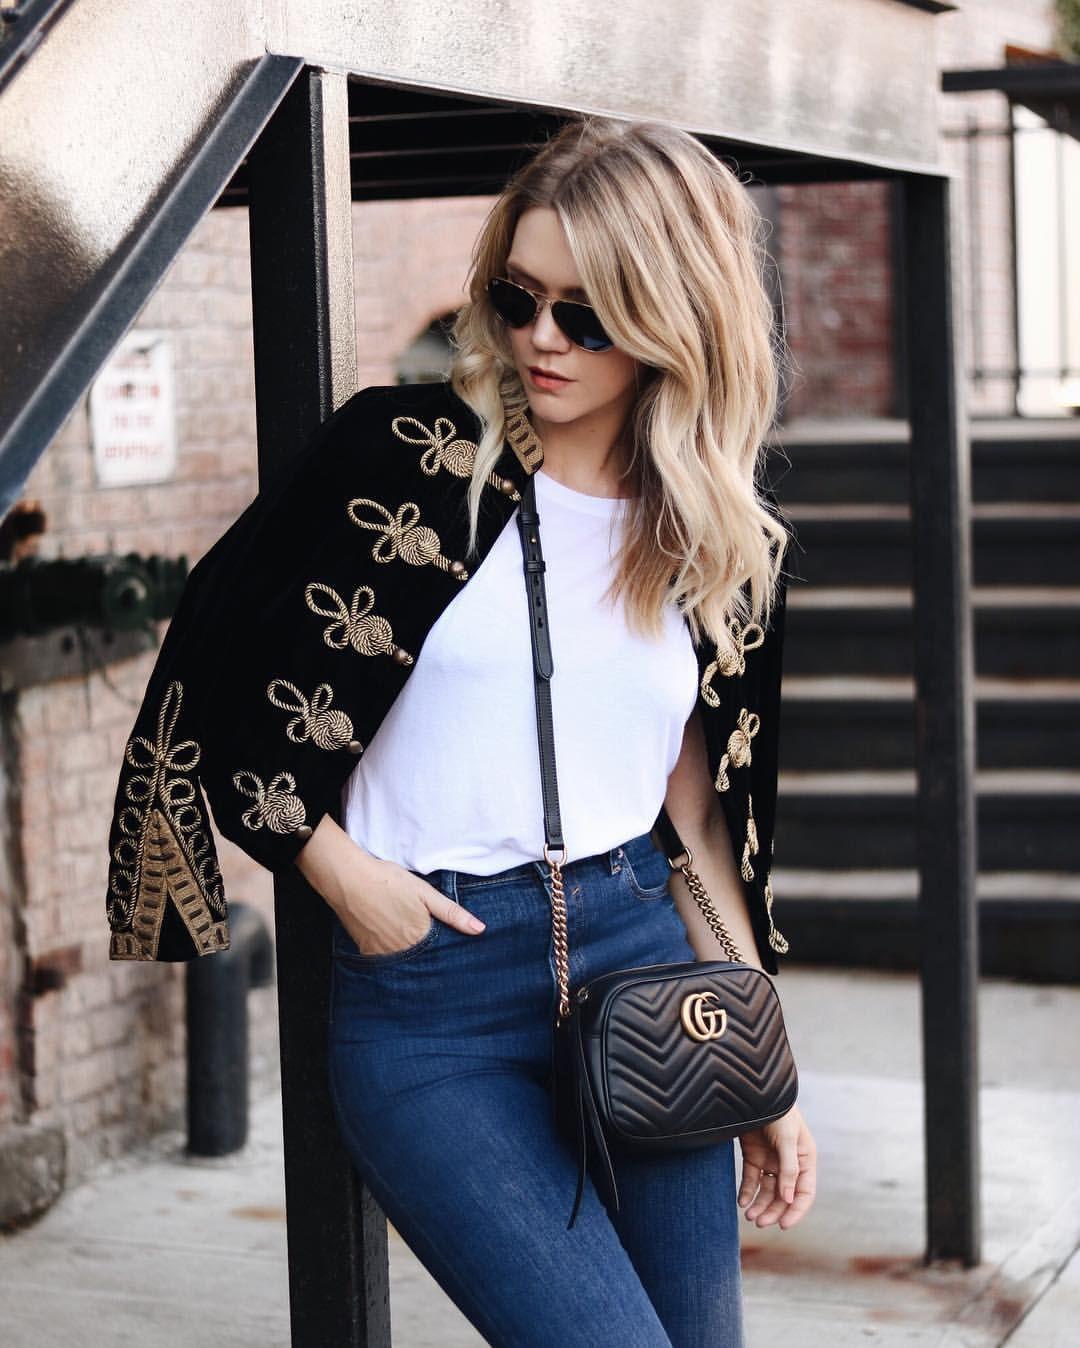 4bfdb8e538bc Gucci Purses, Gucci Handbags, Luxury Handbags, Leather Handbags, Gucci Marmont  Mini,